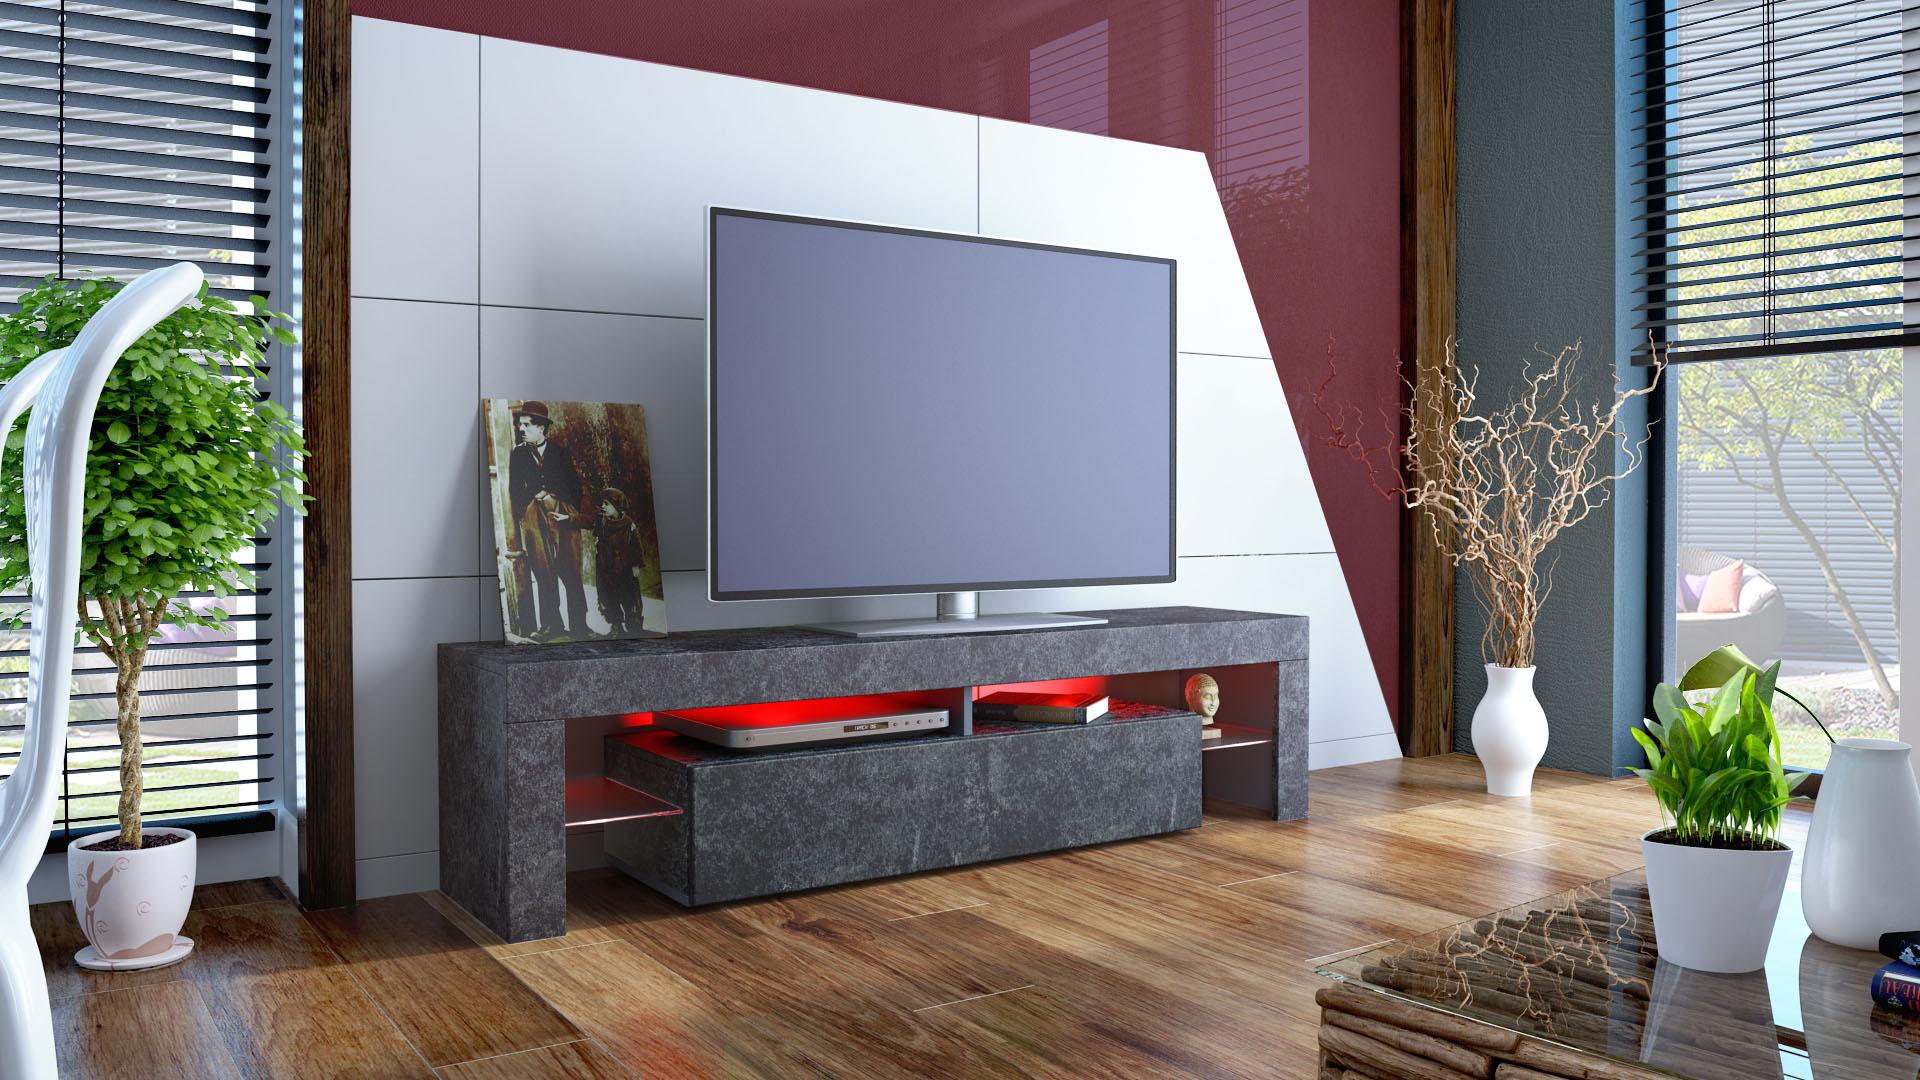 fernseher schrank tv schrank mbel sideboard flachboard lowboard eiche massiv cm fernseher with. Black Bedroom Furniture Sets. Home Design Ideas